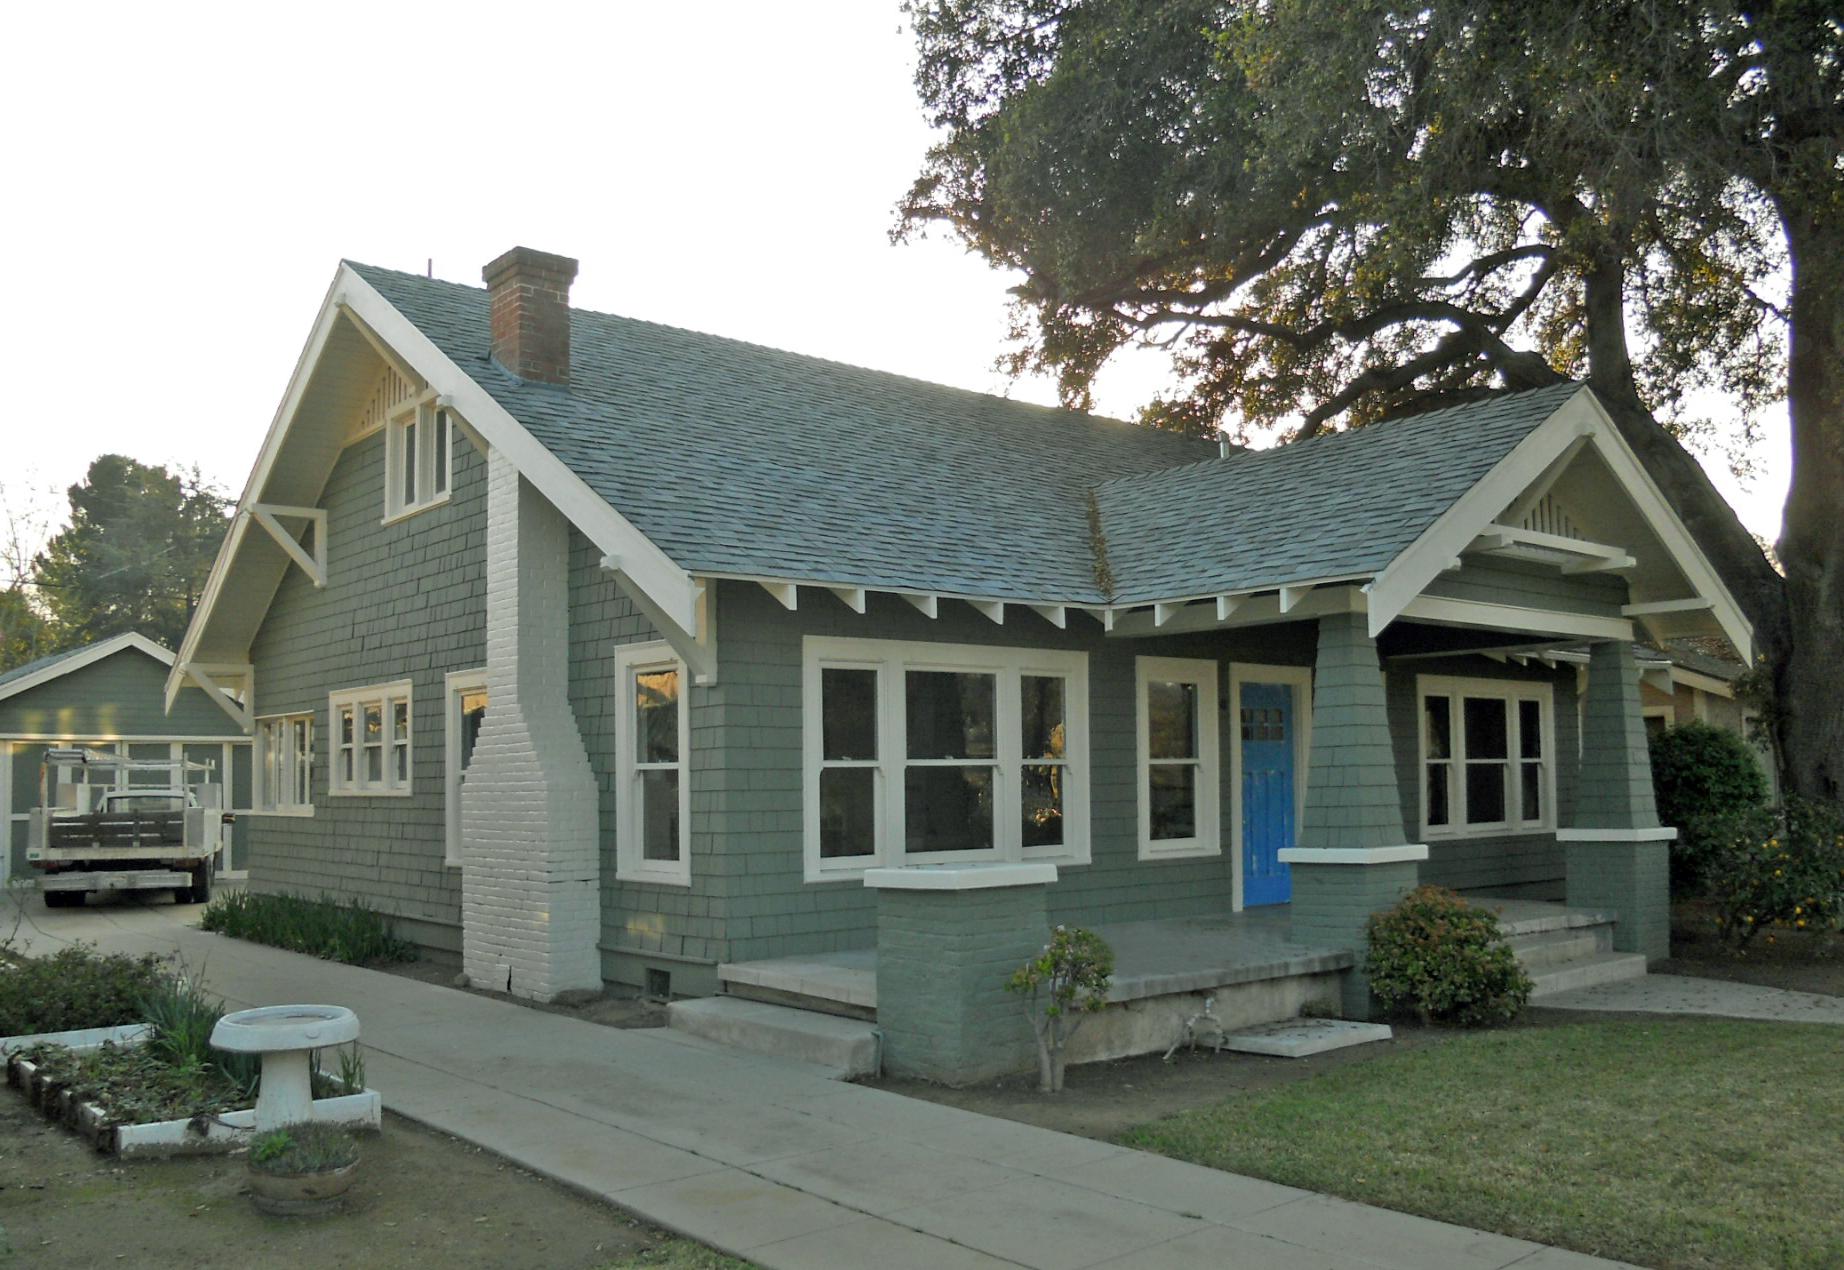 3982 Larchwood Place, Riverside CA 92506